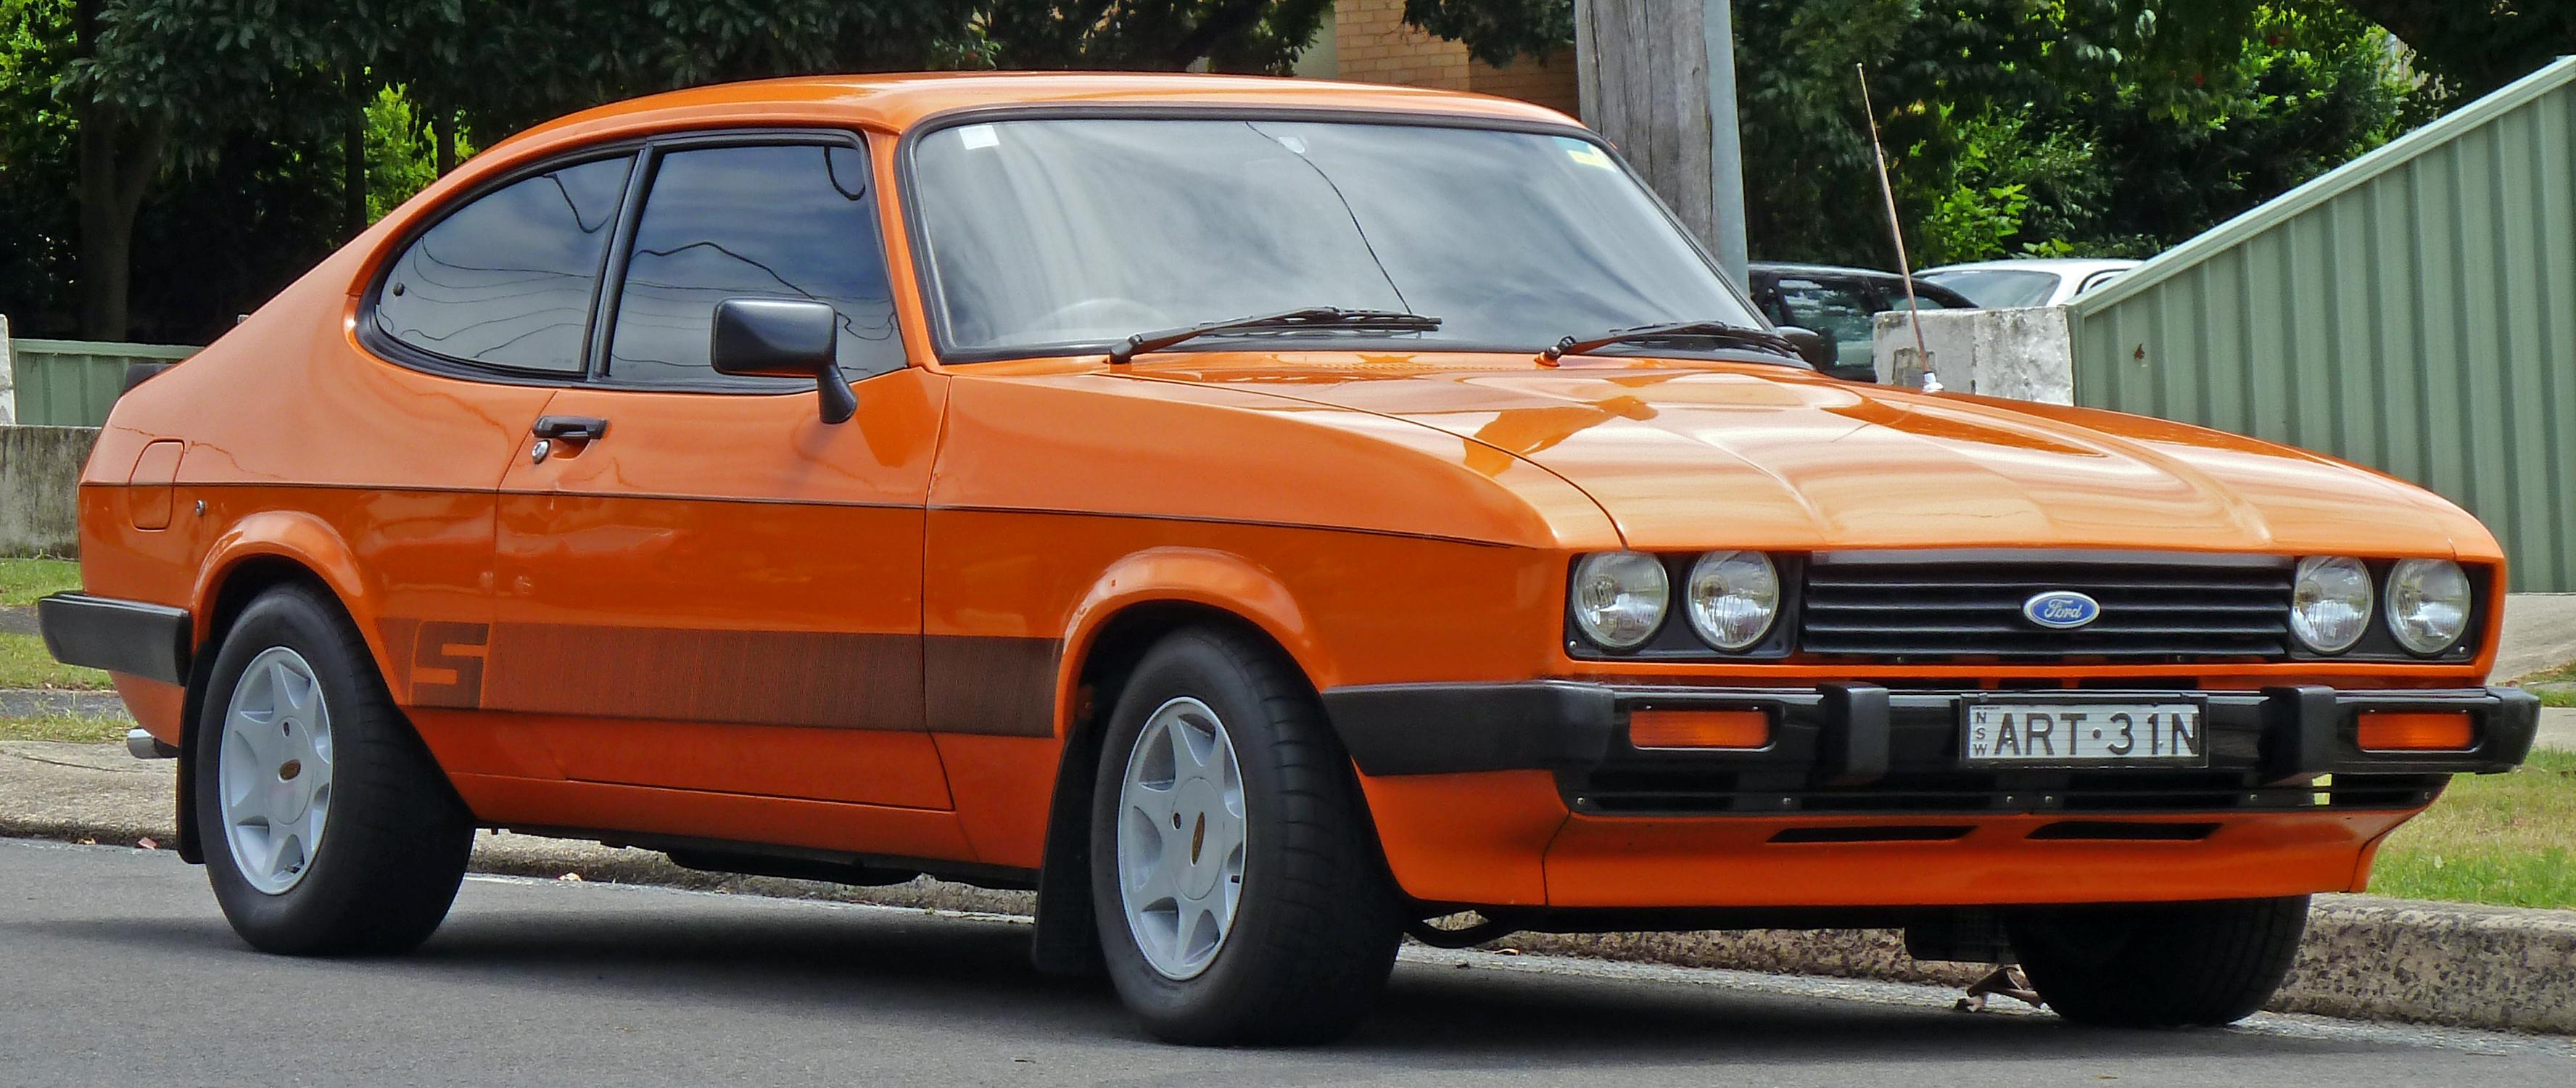 Ford Capri 1983 foto - 4